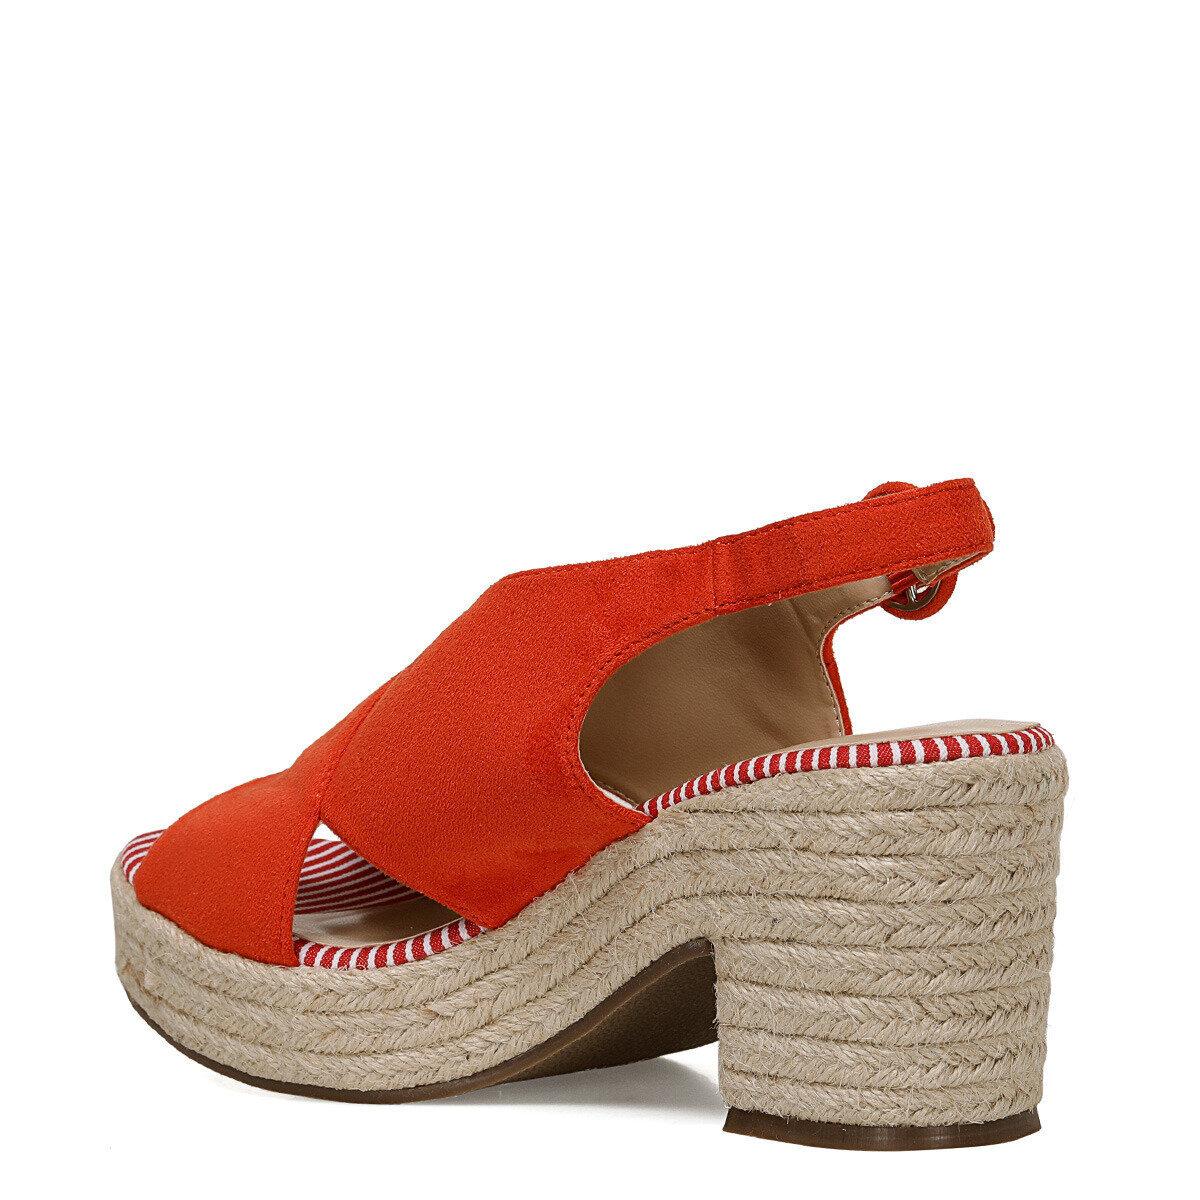 NORMINA Turuncu Kadın Dolgu Topuklu Sandalet